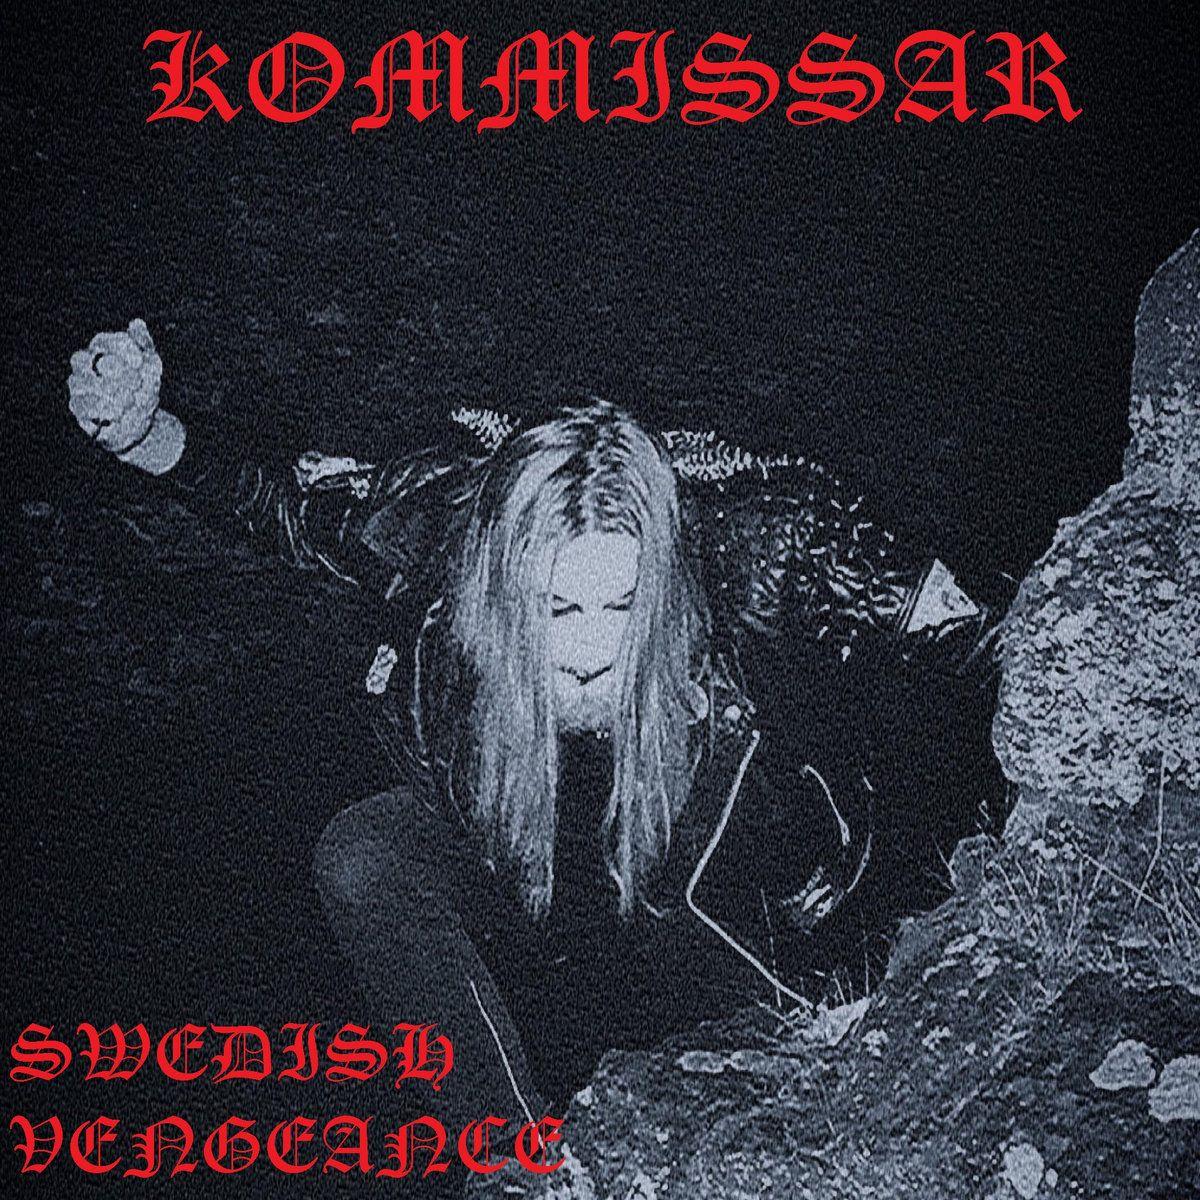 Kommissar - Swedish Vengeance